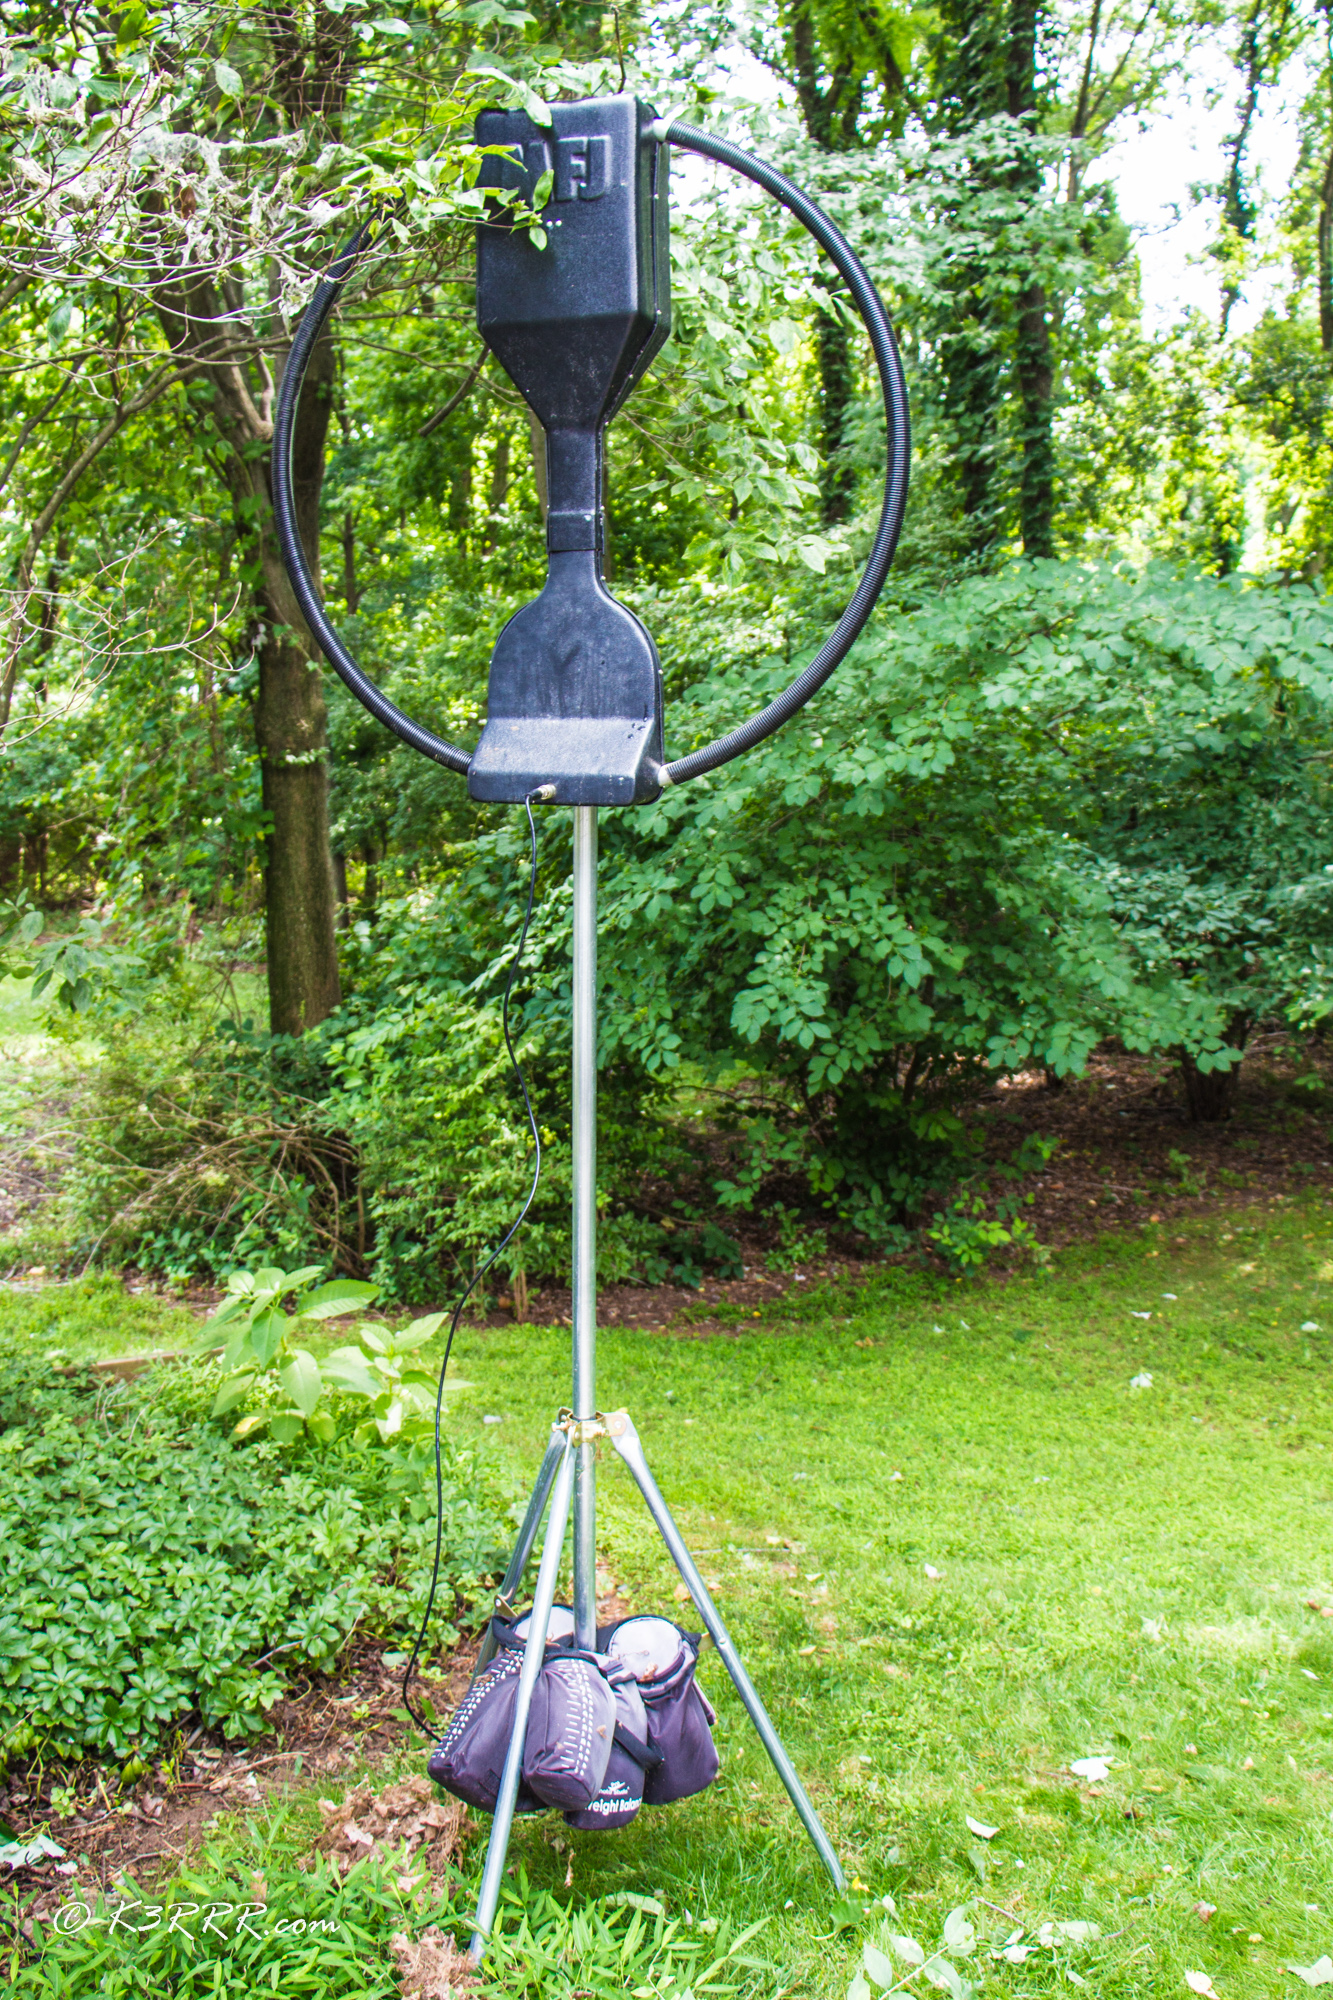 MFJ-1786 Loop Antenna - My Stealth Antenna Installations | K3RRR